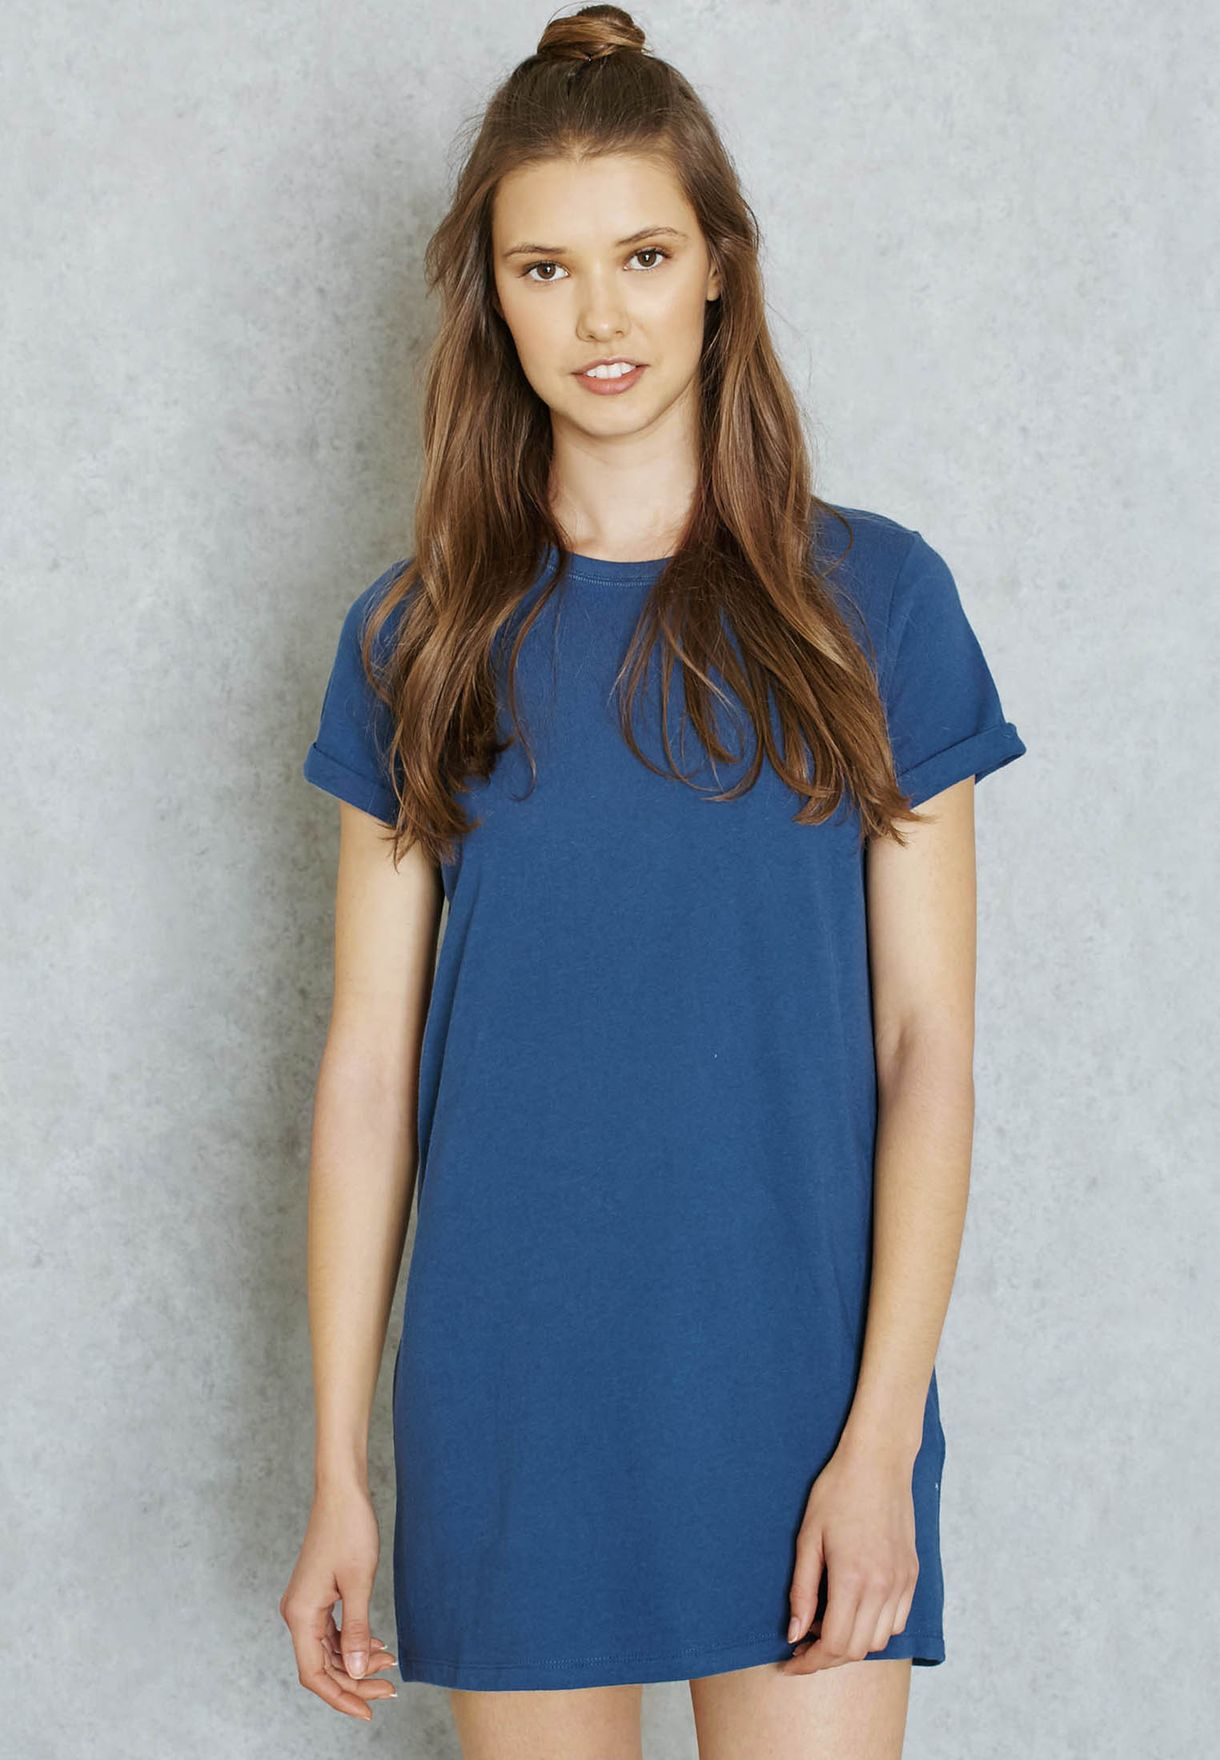 7ec19256d7f Shop Forever 21 blue Essential T-Shirt Dress 221834 for Women in ...